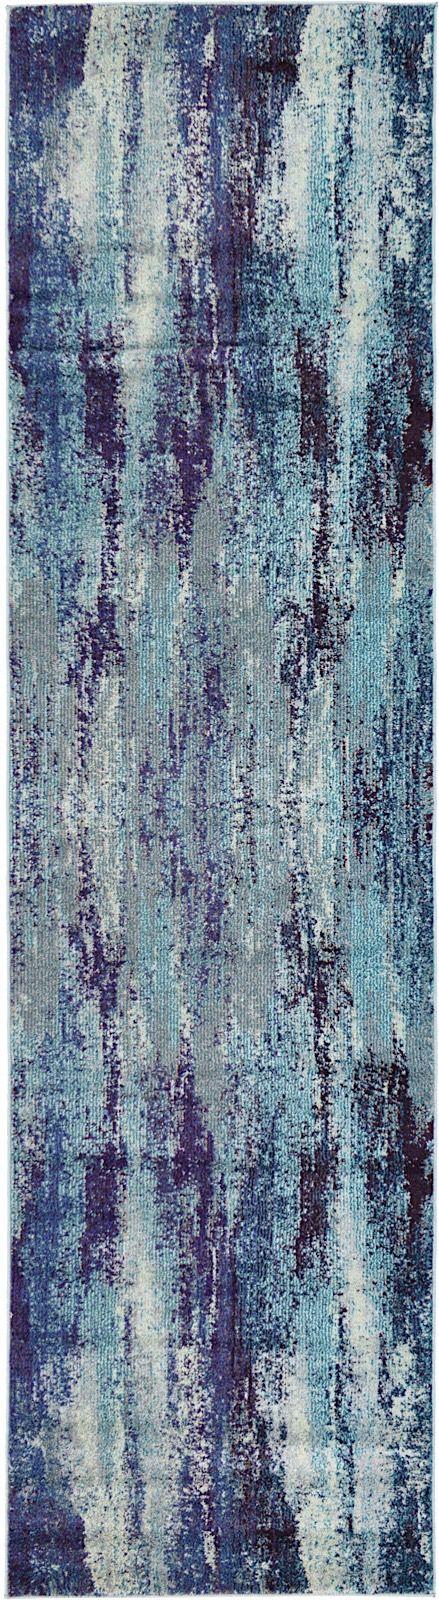 rugpal meadow contemporary area rug collection